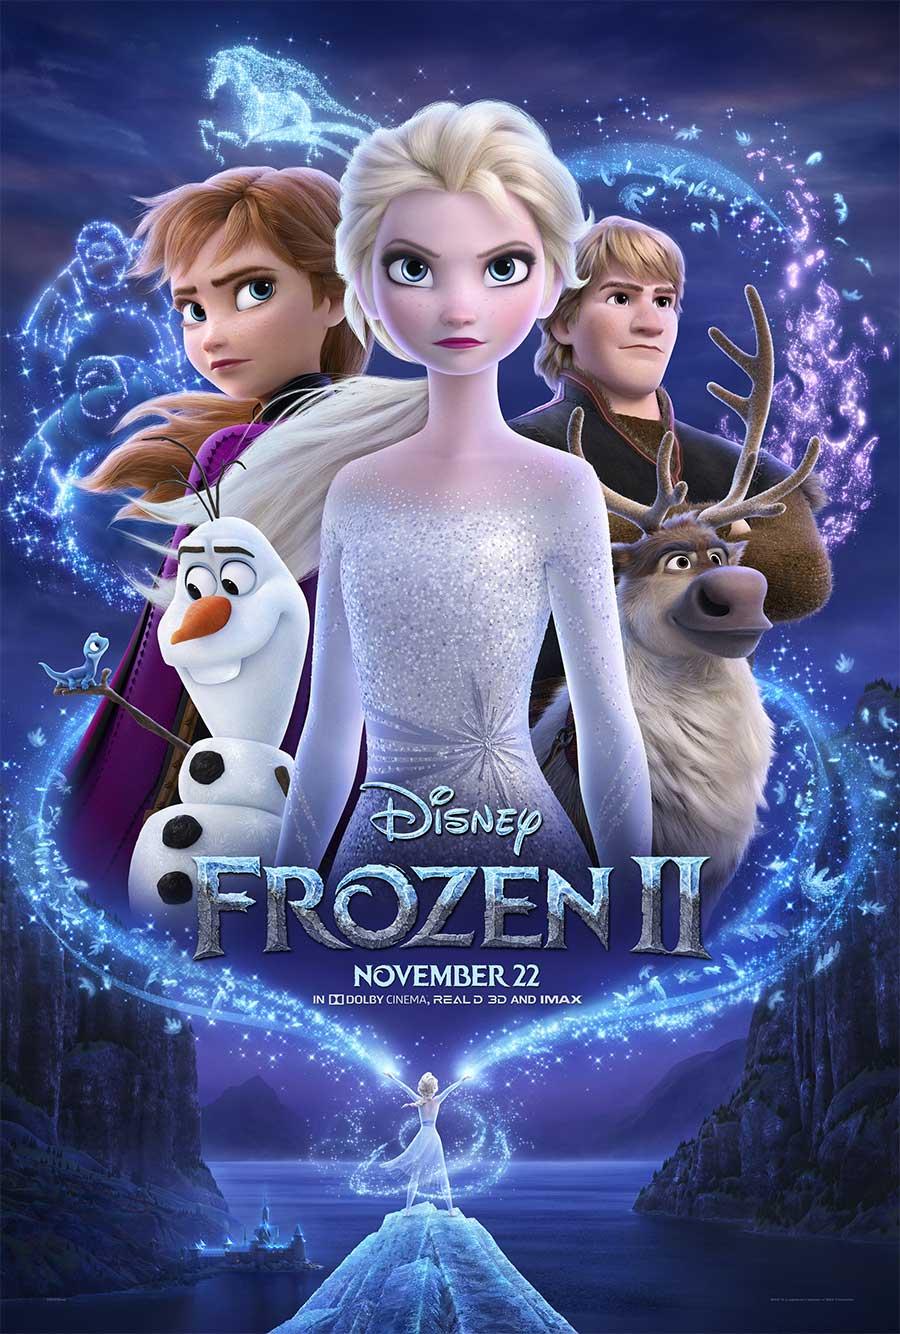 Poster for Frozen II